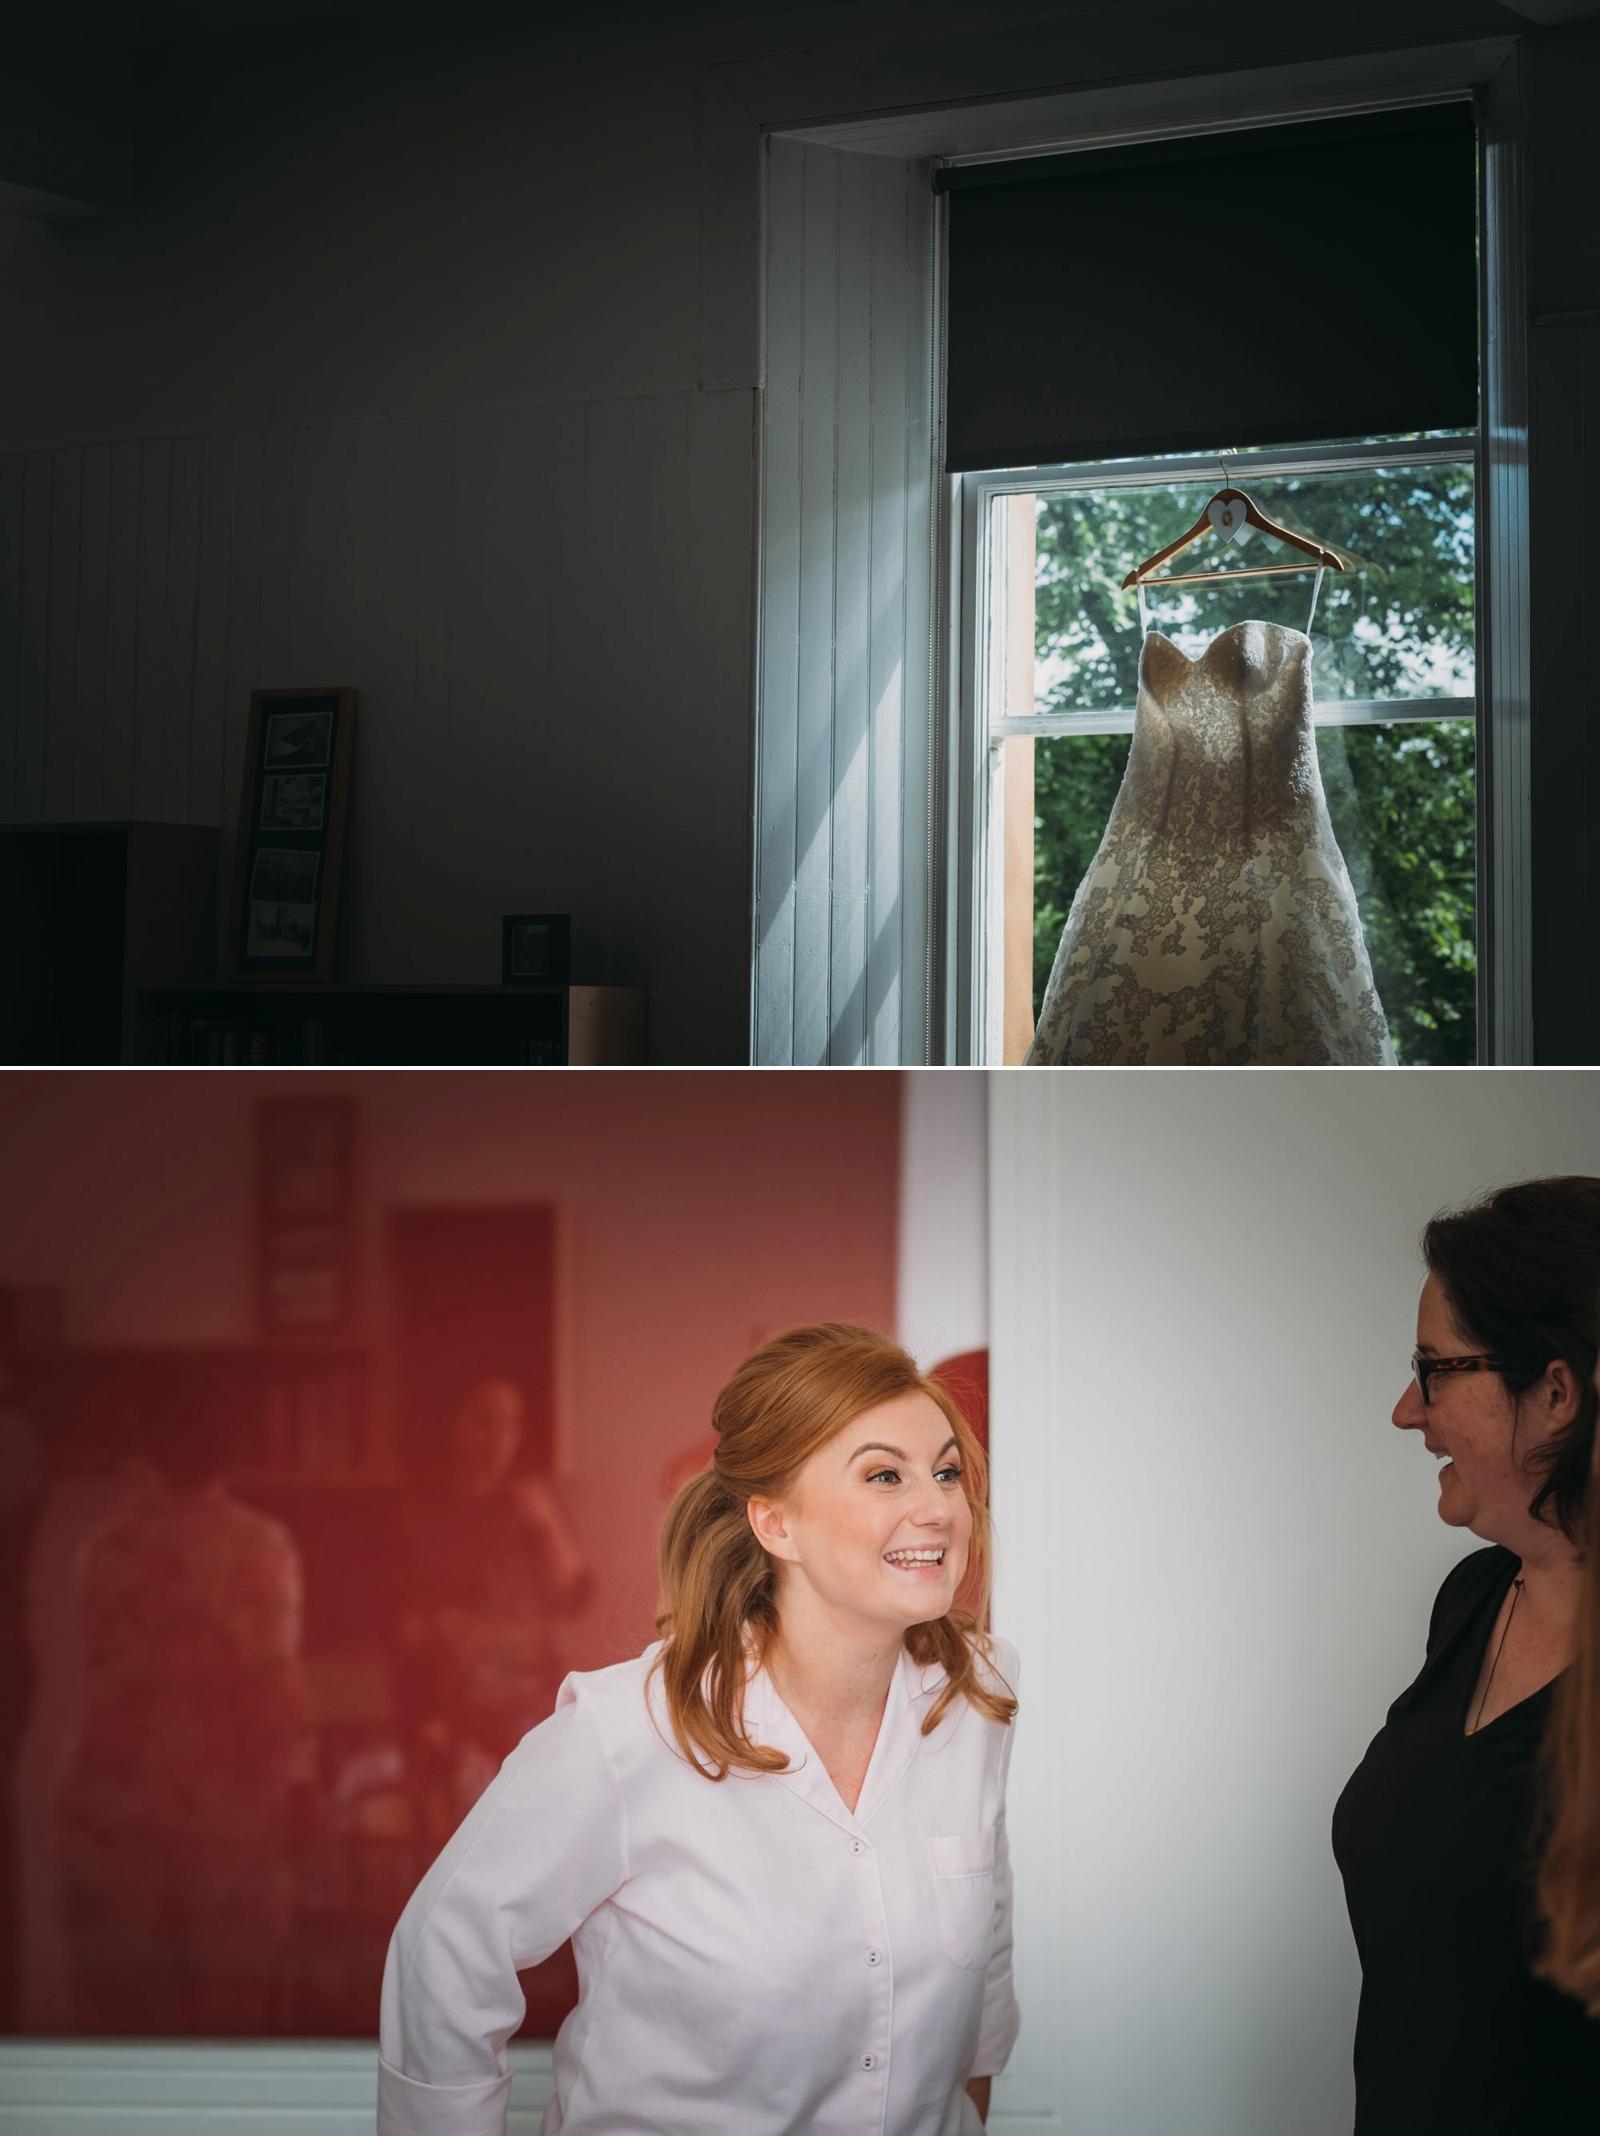 Gillian-Evan-West-Brewery-Jo-Donaldson-Photography-21.jpg